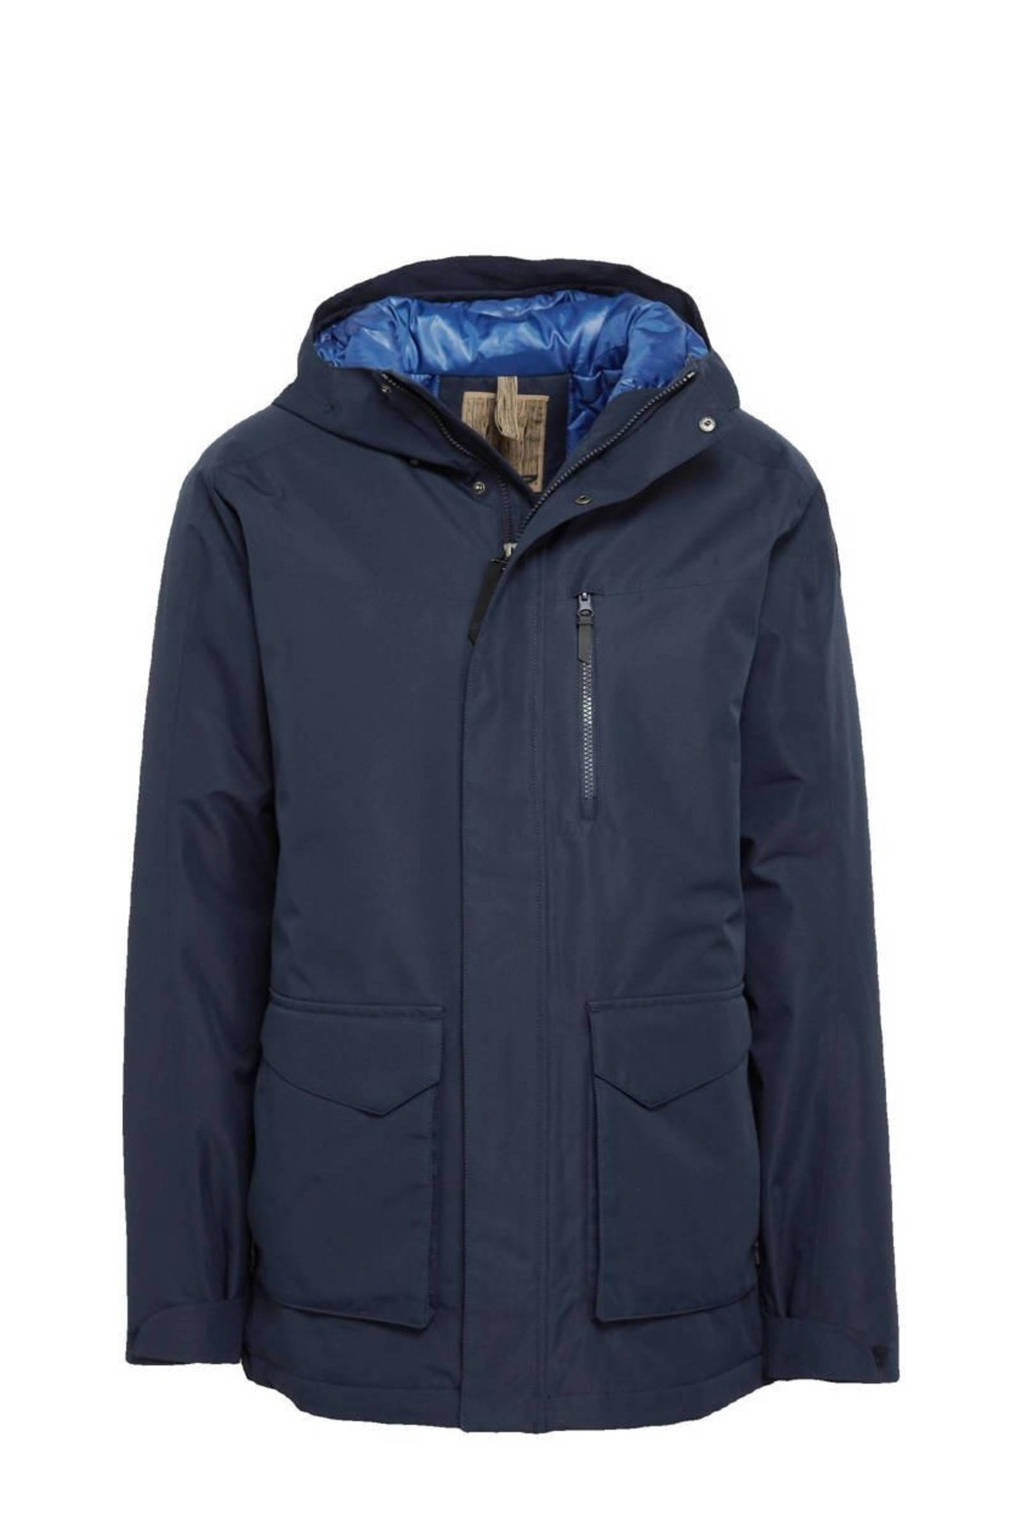 Icepeak outdoor jas Antler donkerblauw, Donkerblauw